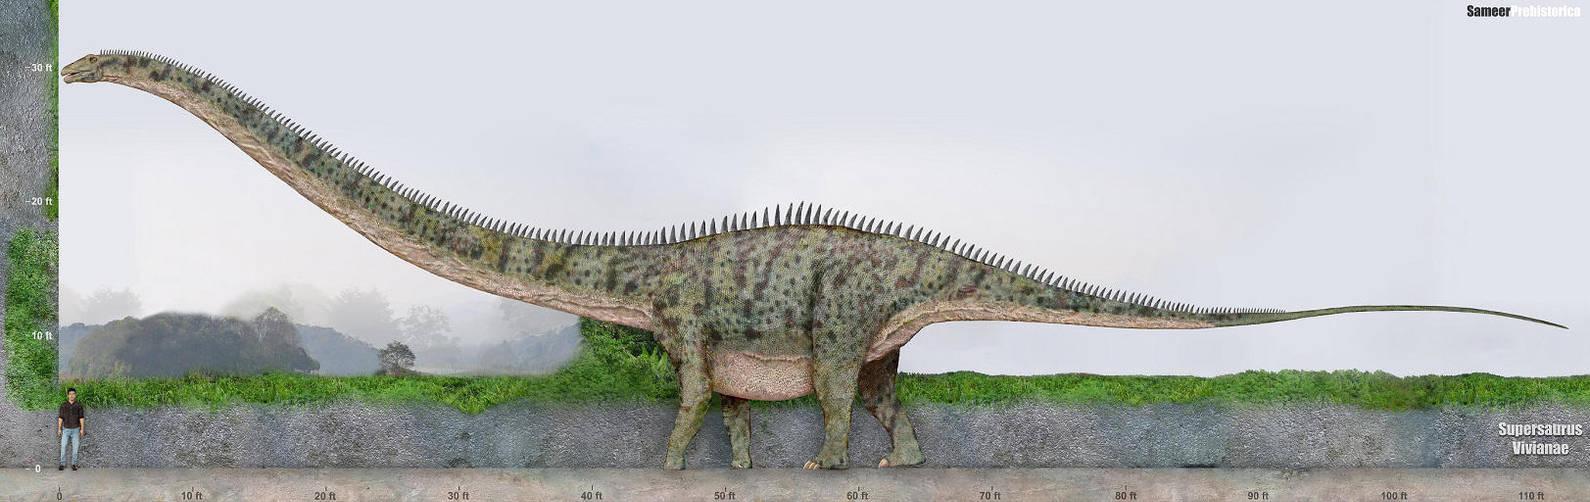 Supersaurus by SameerPrehistorica